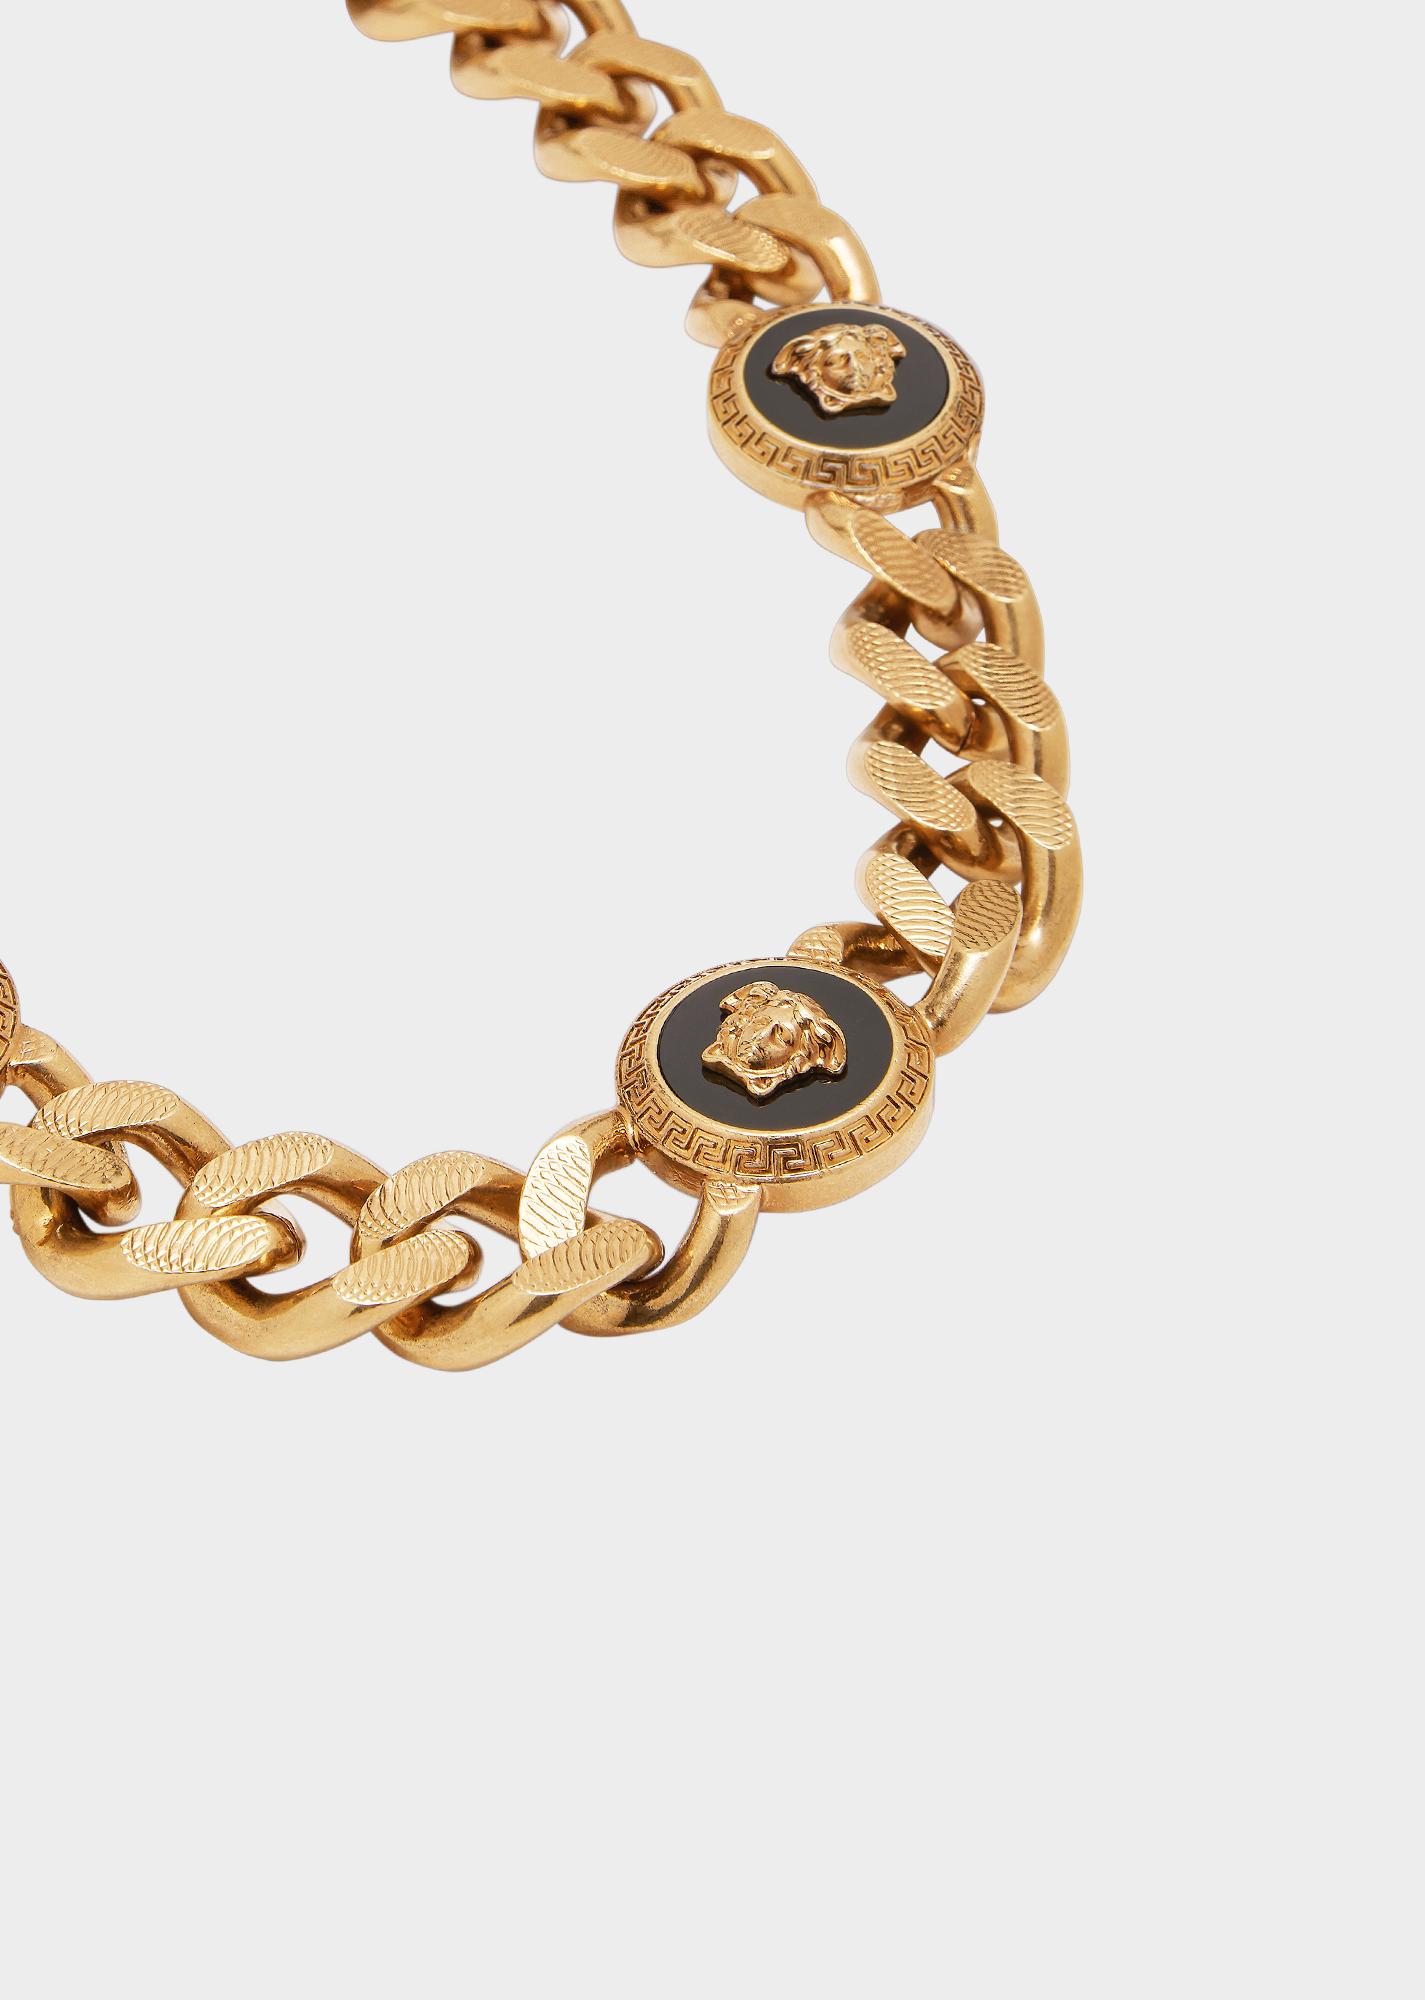 Versace Necklaces & Chains for Men.